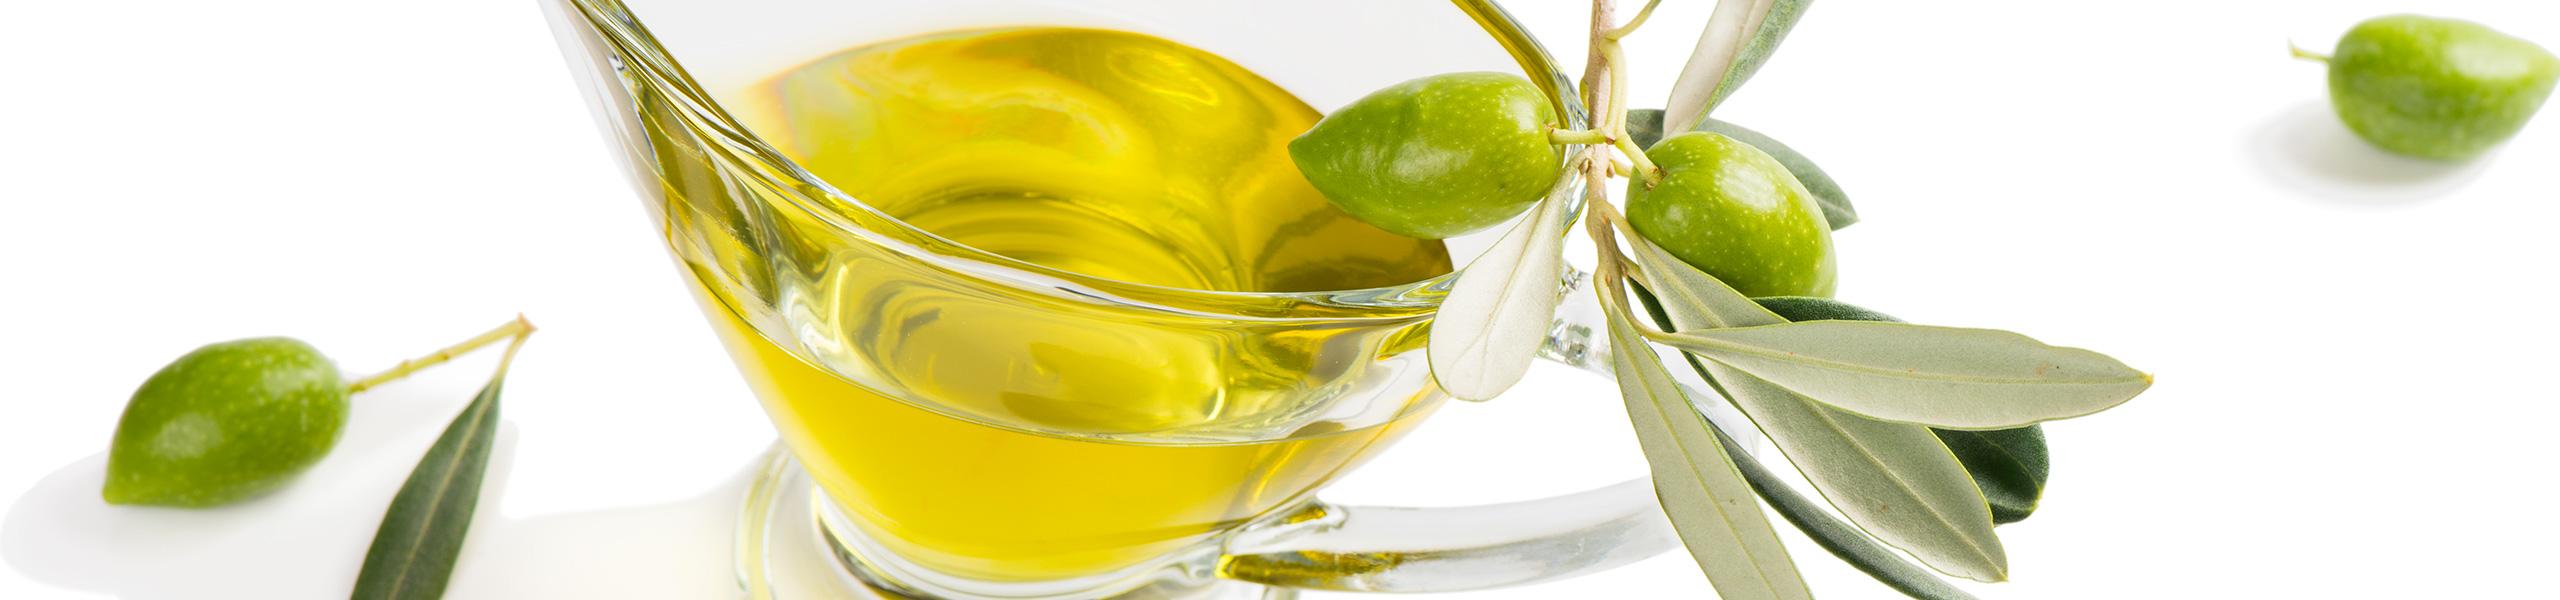 Olio extra vergine di oliva Il Classico 5 L